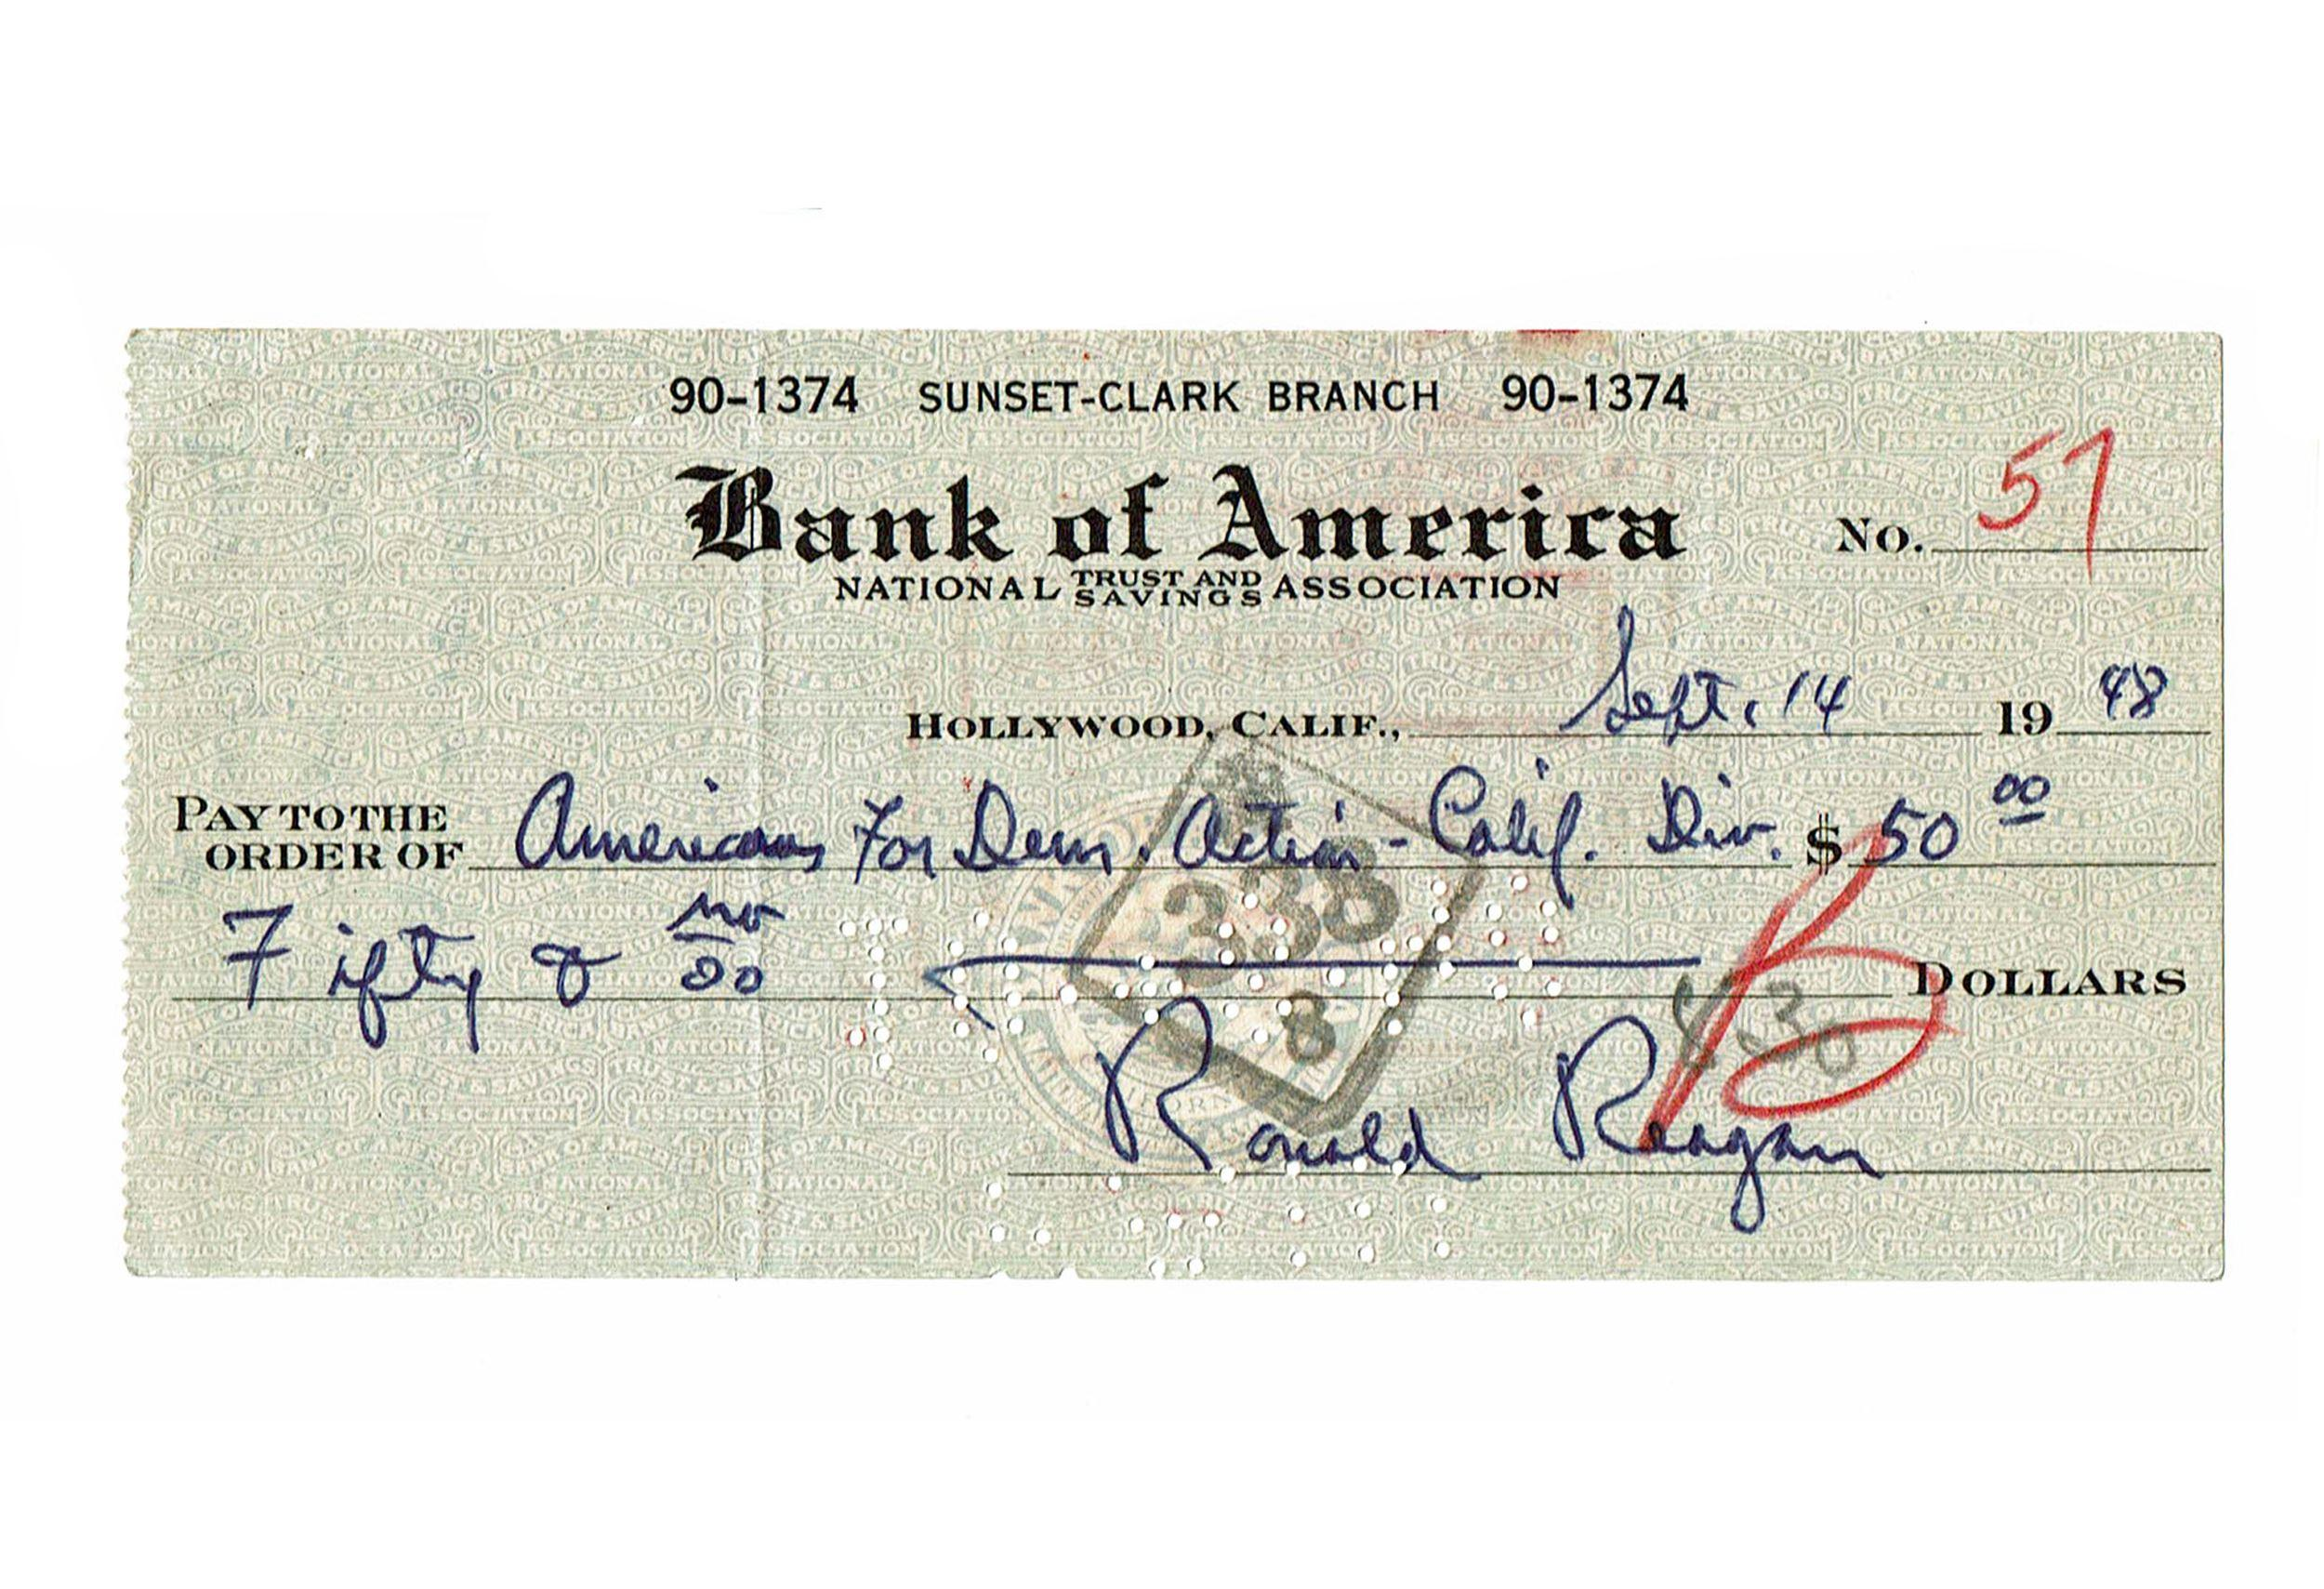 Republican Icon Ronald Reagan Supports Democratic Organization, Unique Bank Check